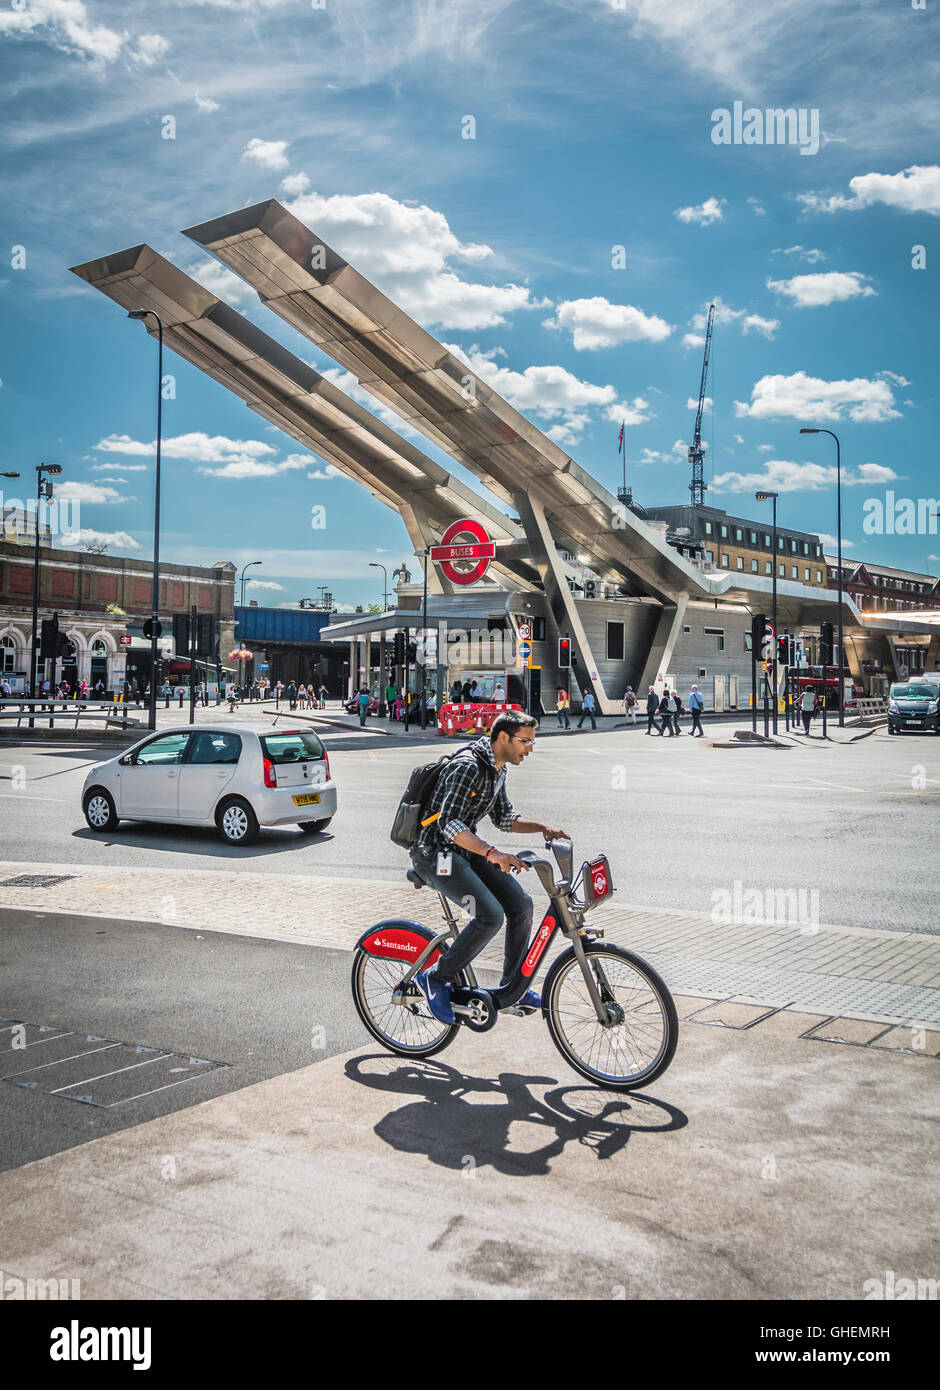 Vauxhall Cross transport interchange in the London Borough of Lambeth, London,  United Kingdom - Stock Image